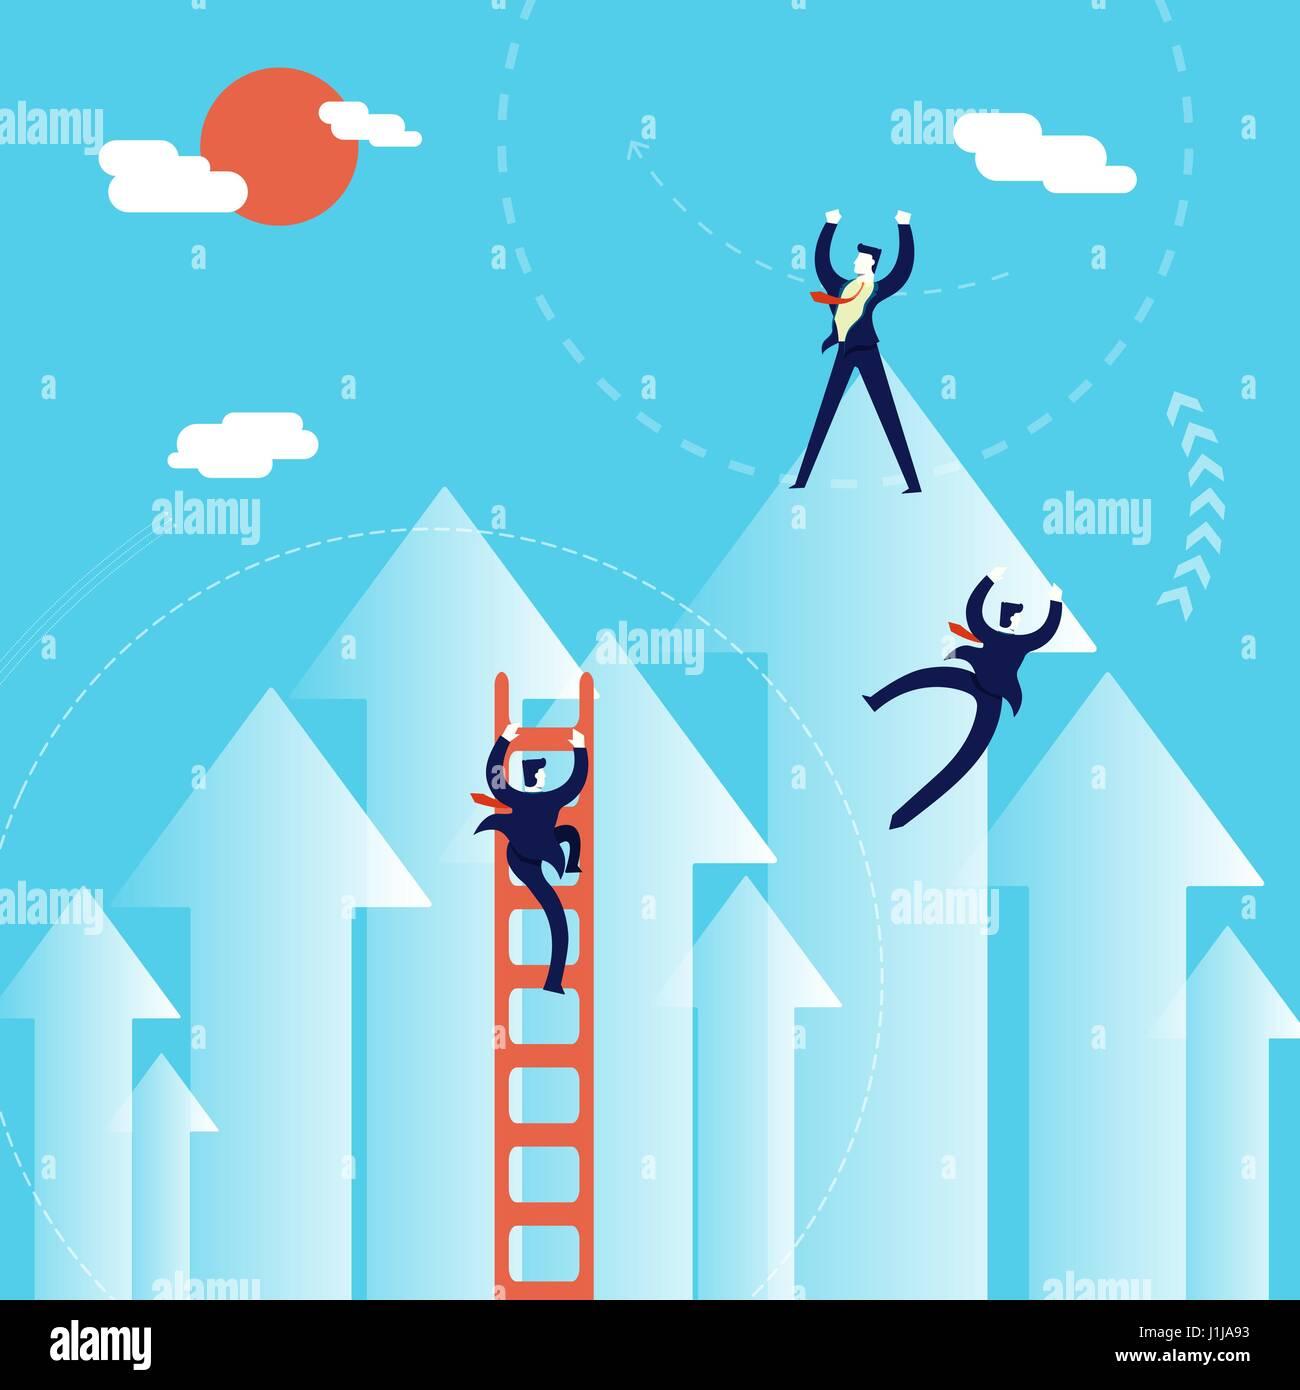 Geschäft Wachstum Konzept Abbildung team Geschäftsleute Klettern positiven Richtung zum Erfolg. EPS10 Stockbild